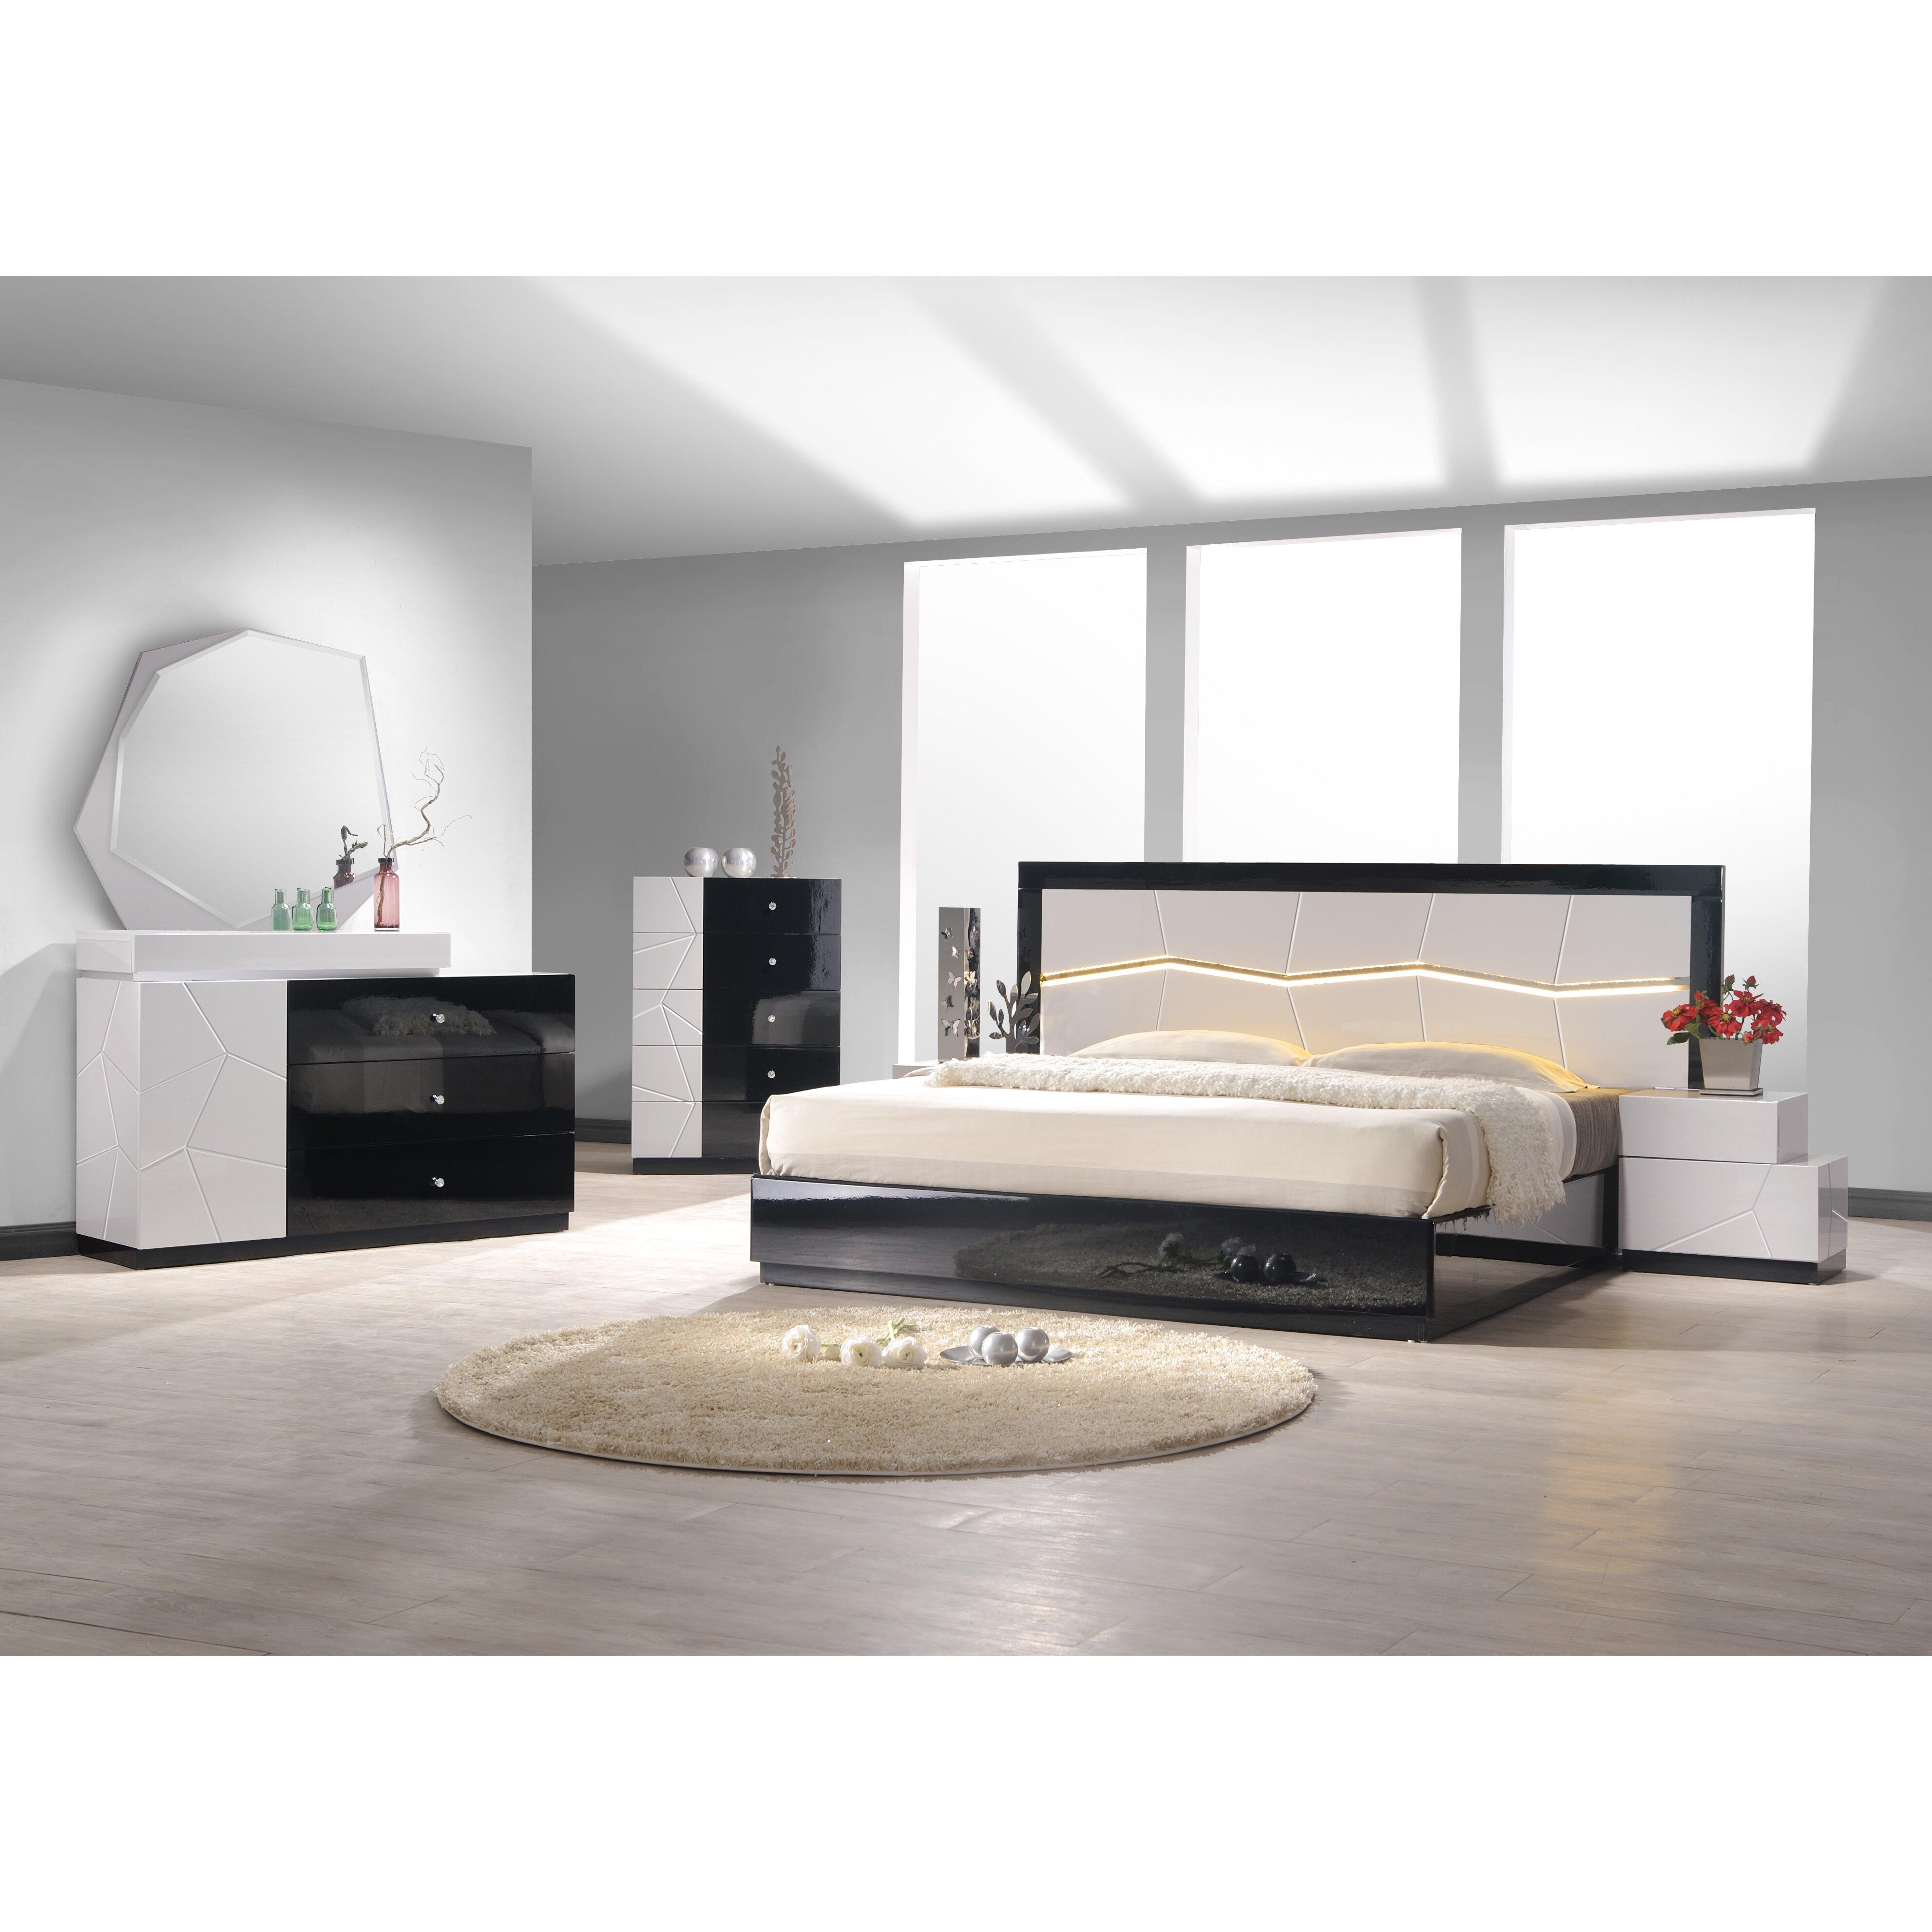 JandM Furniture Turin Platform Customizable